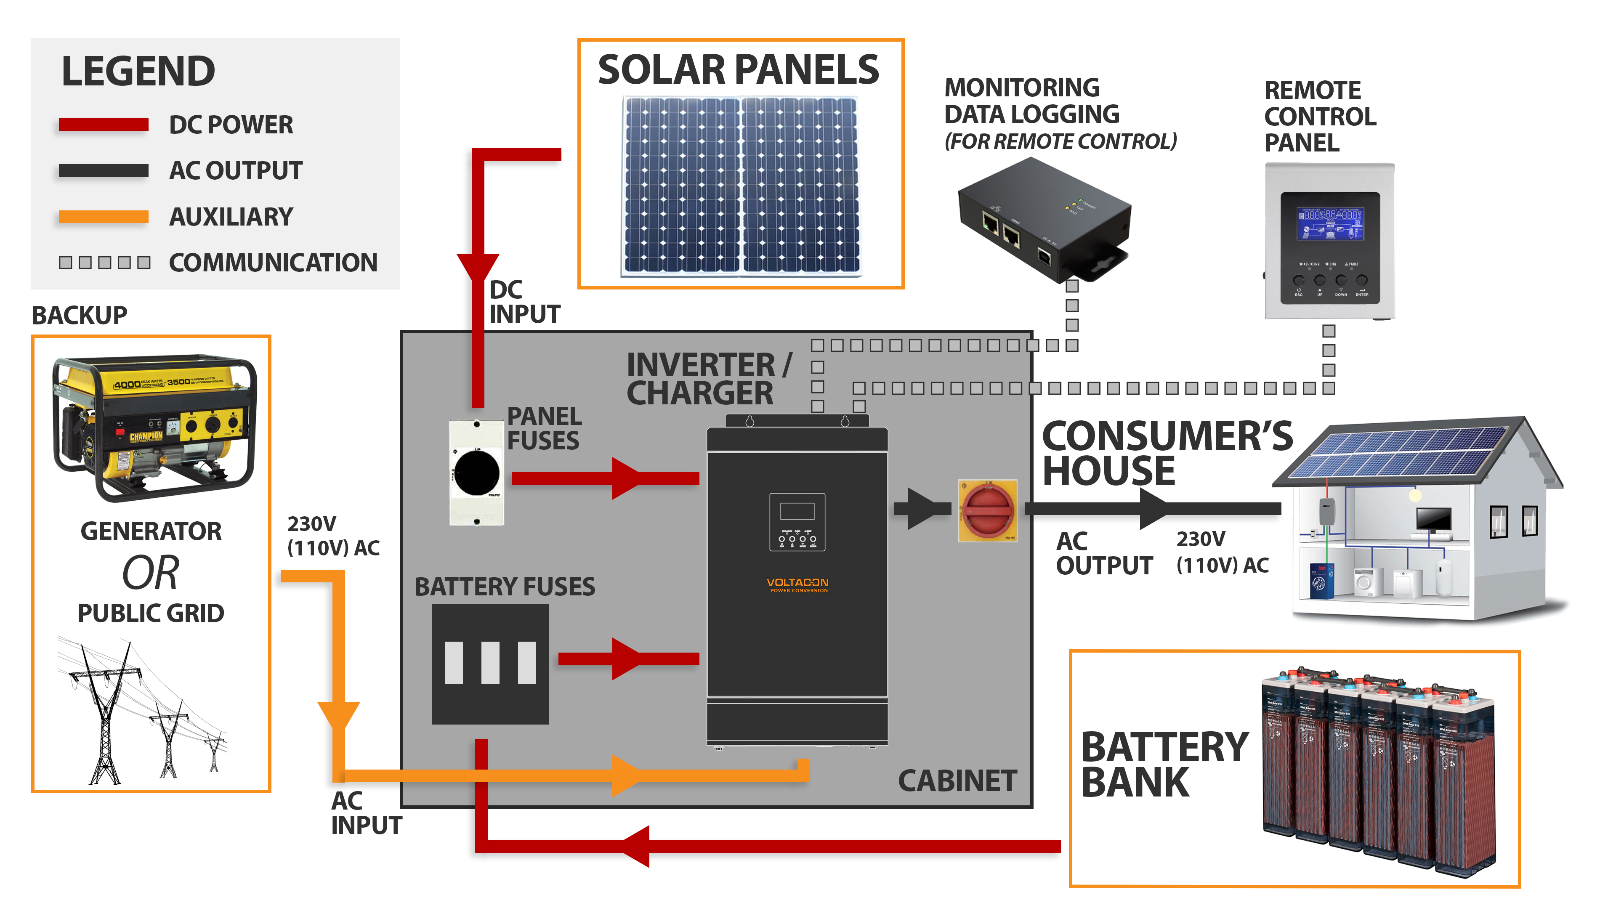 5kva solar off grid system agm batteries 48v 230v inverter 12x250w panels ebay [ 1600 x 916 Pixel ]